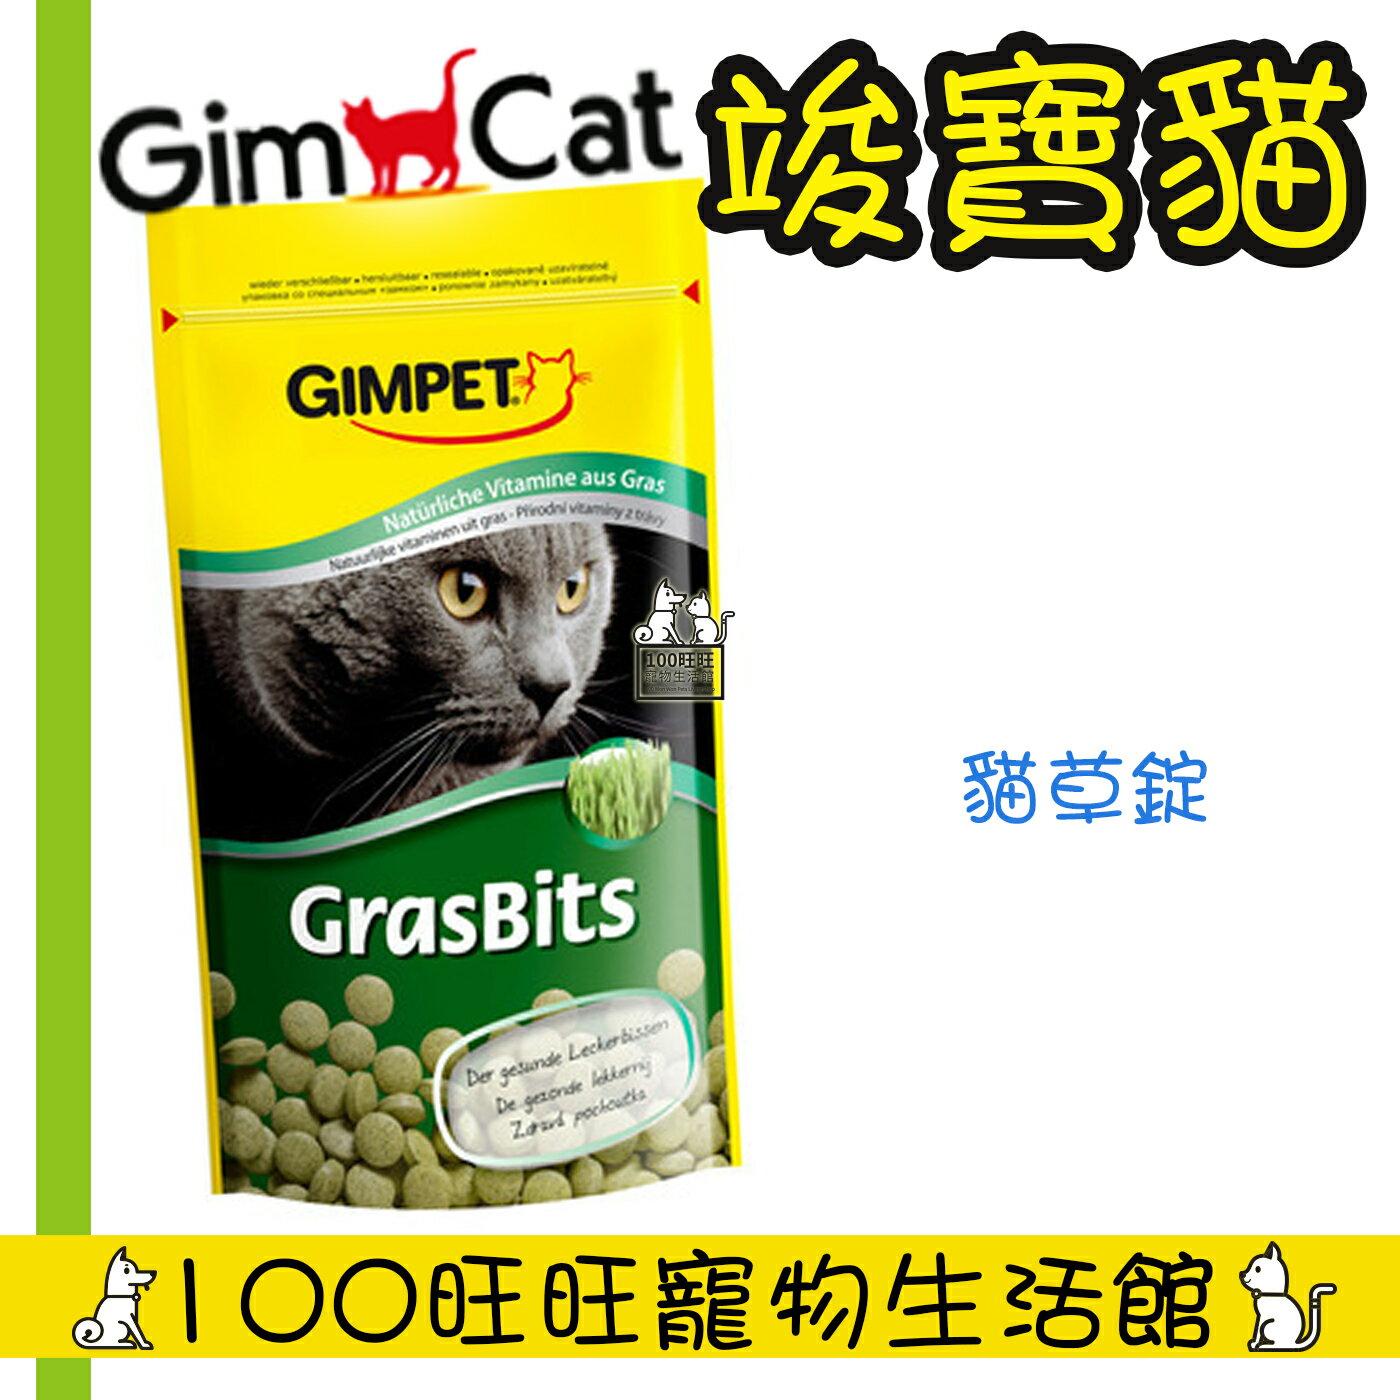 GimCat 德國 竣寶 貓草錠 85粒